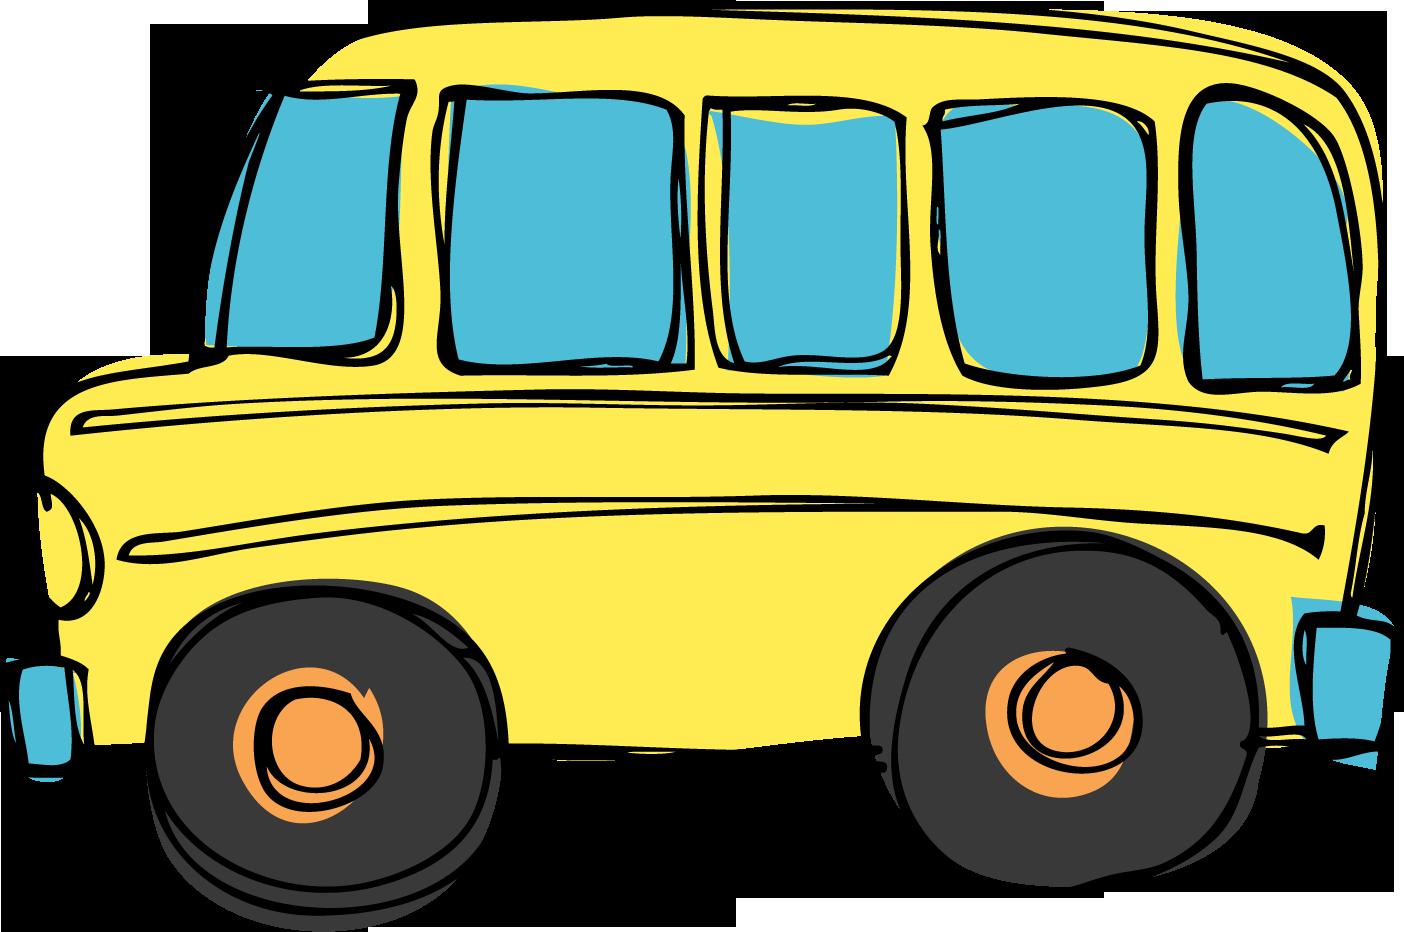 School bus clipart 4